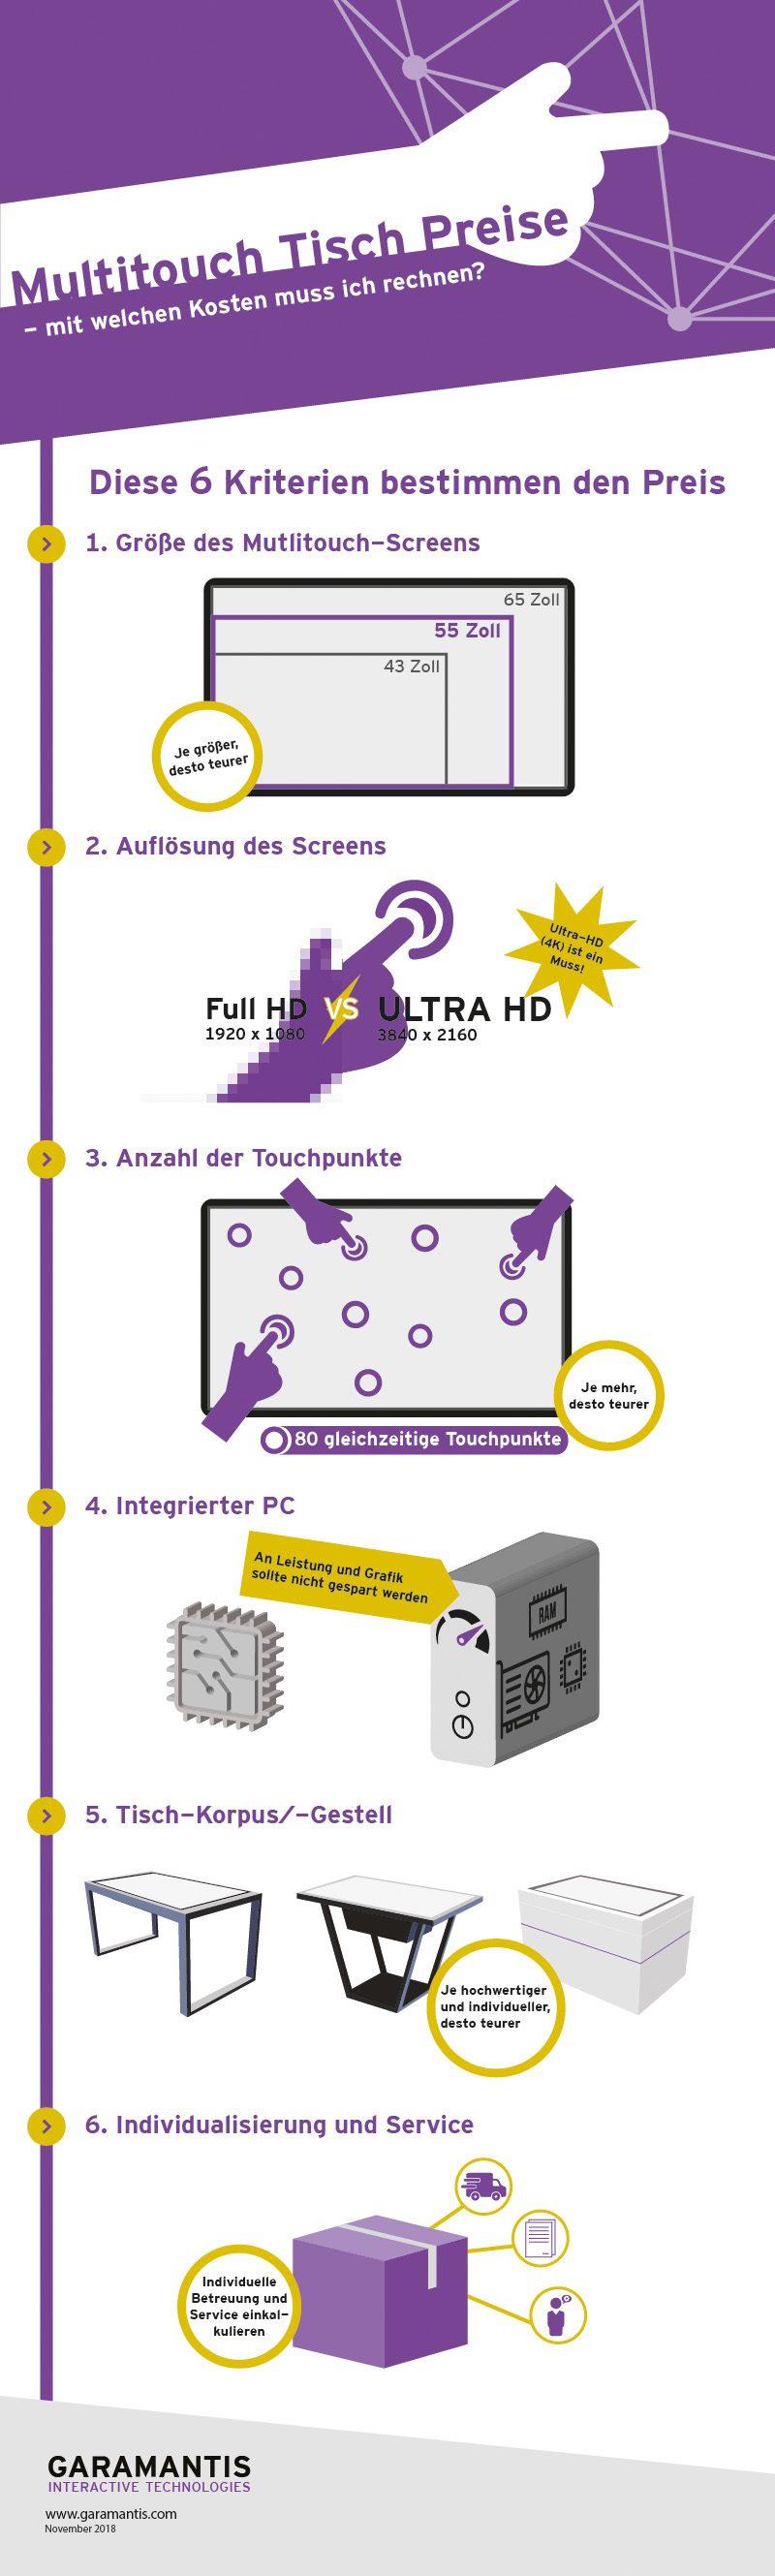 Multitouch Tisch Preis Infografik